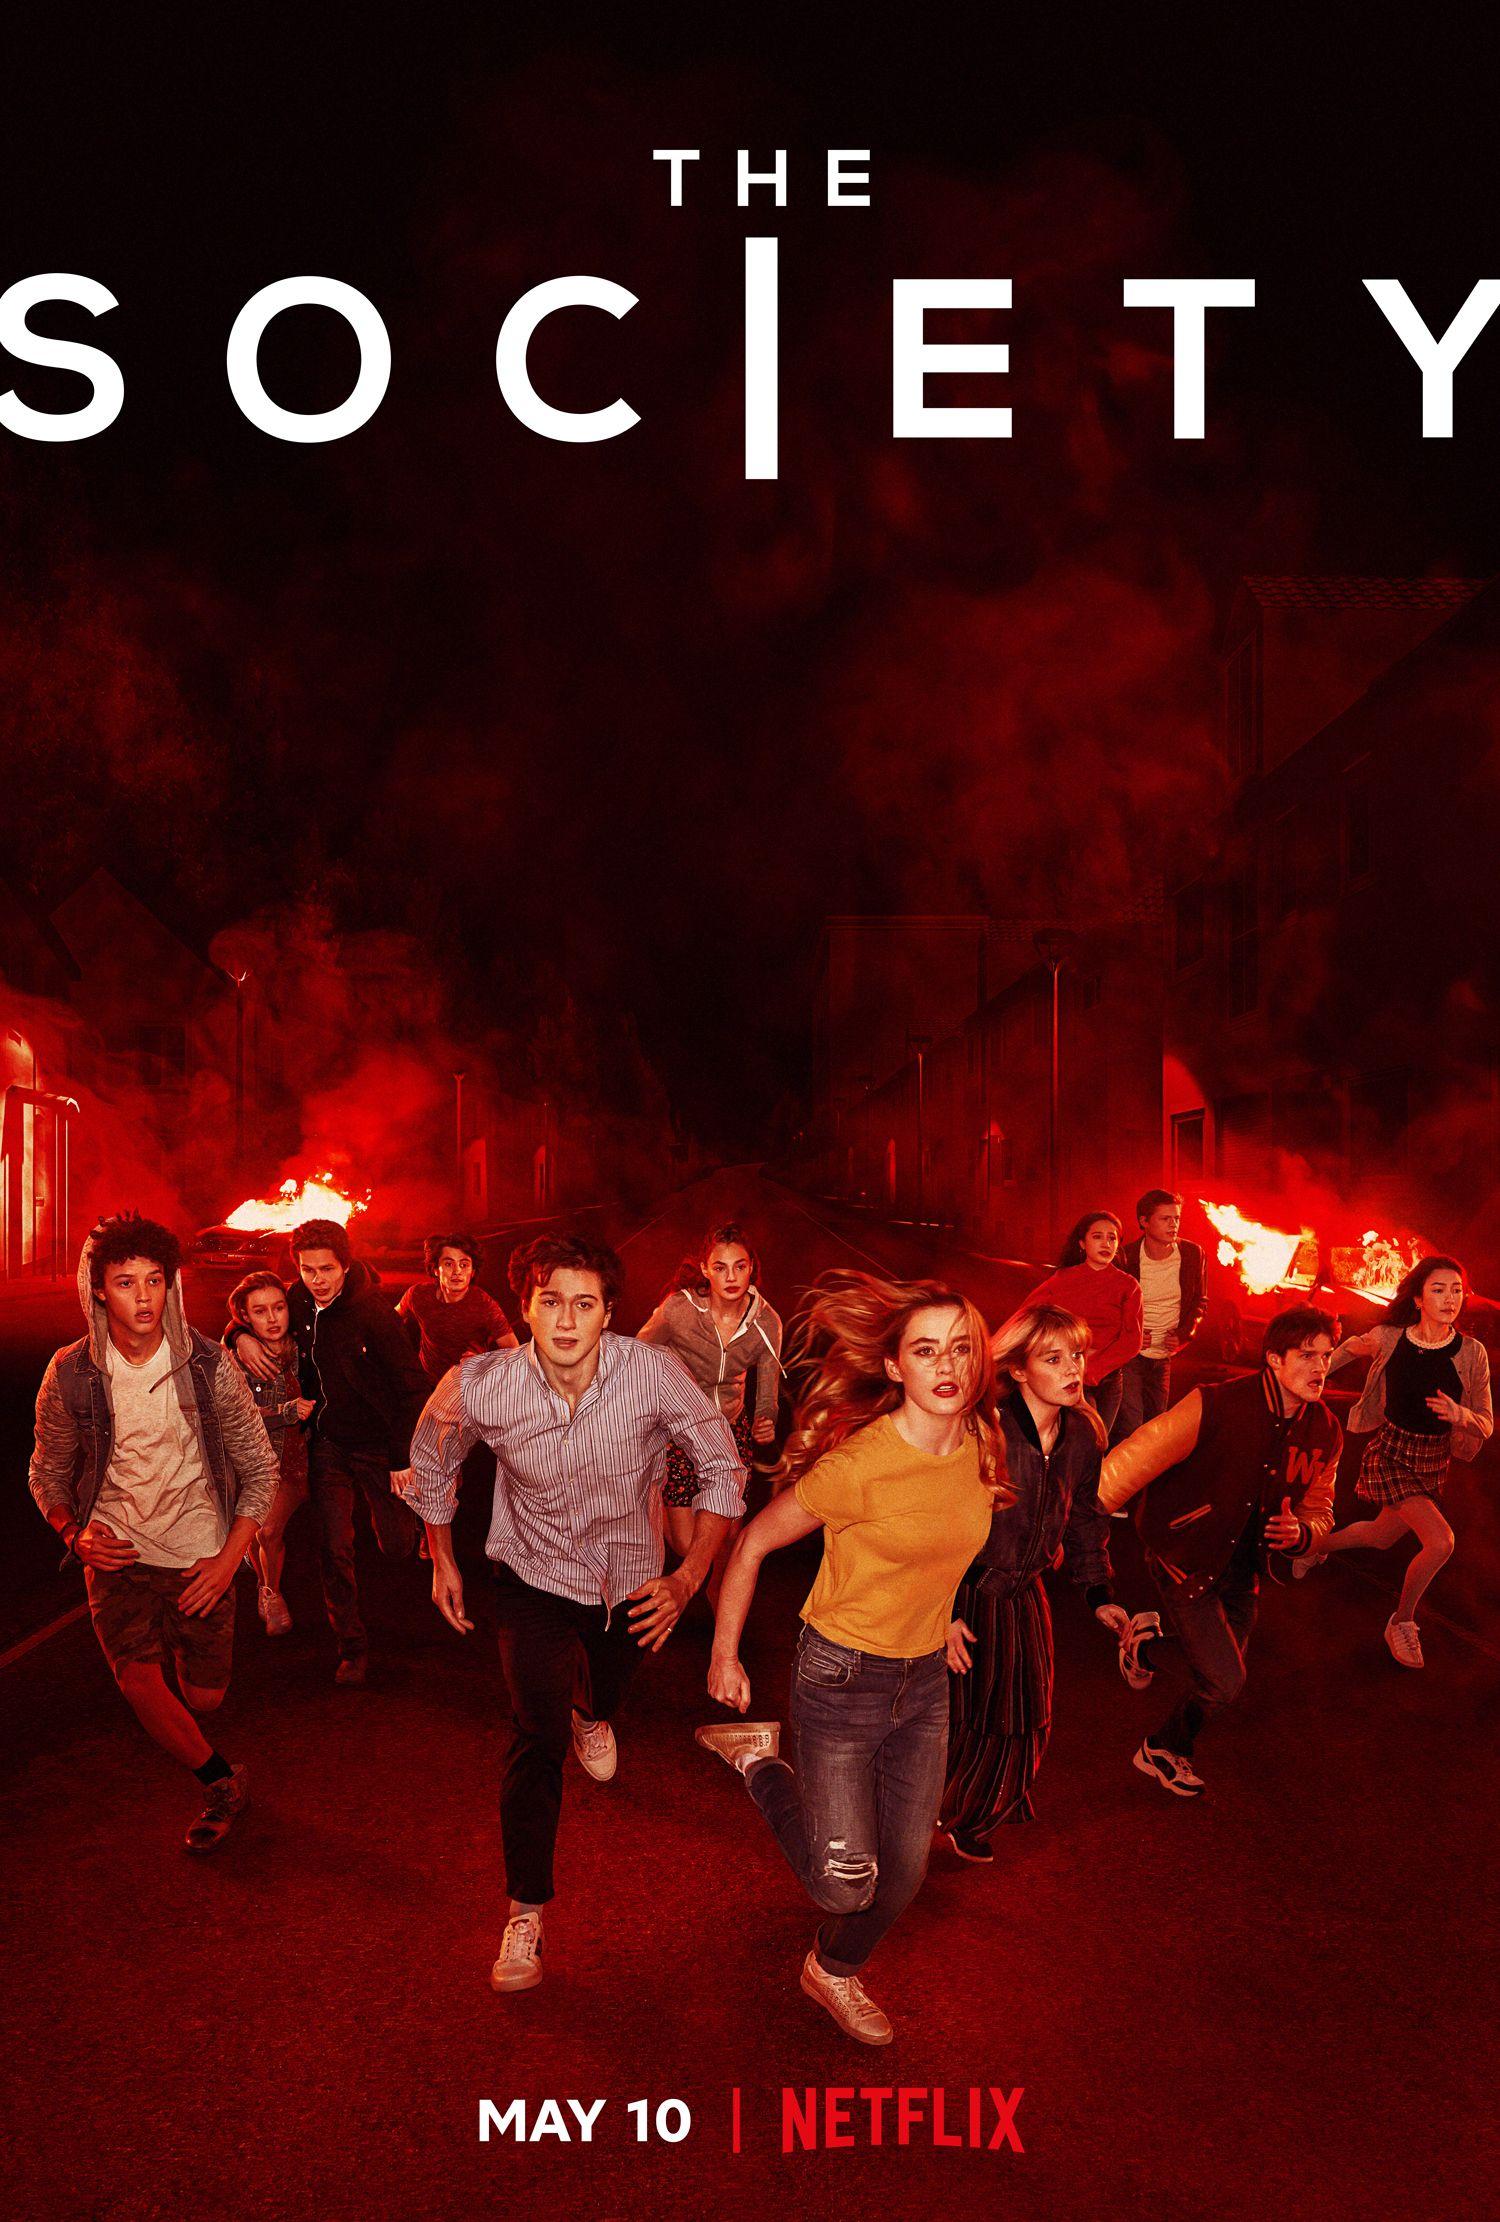 Netflix's The Society has been renewed for season 2